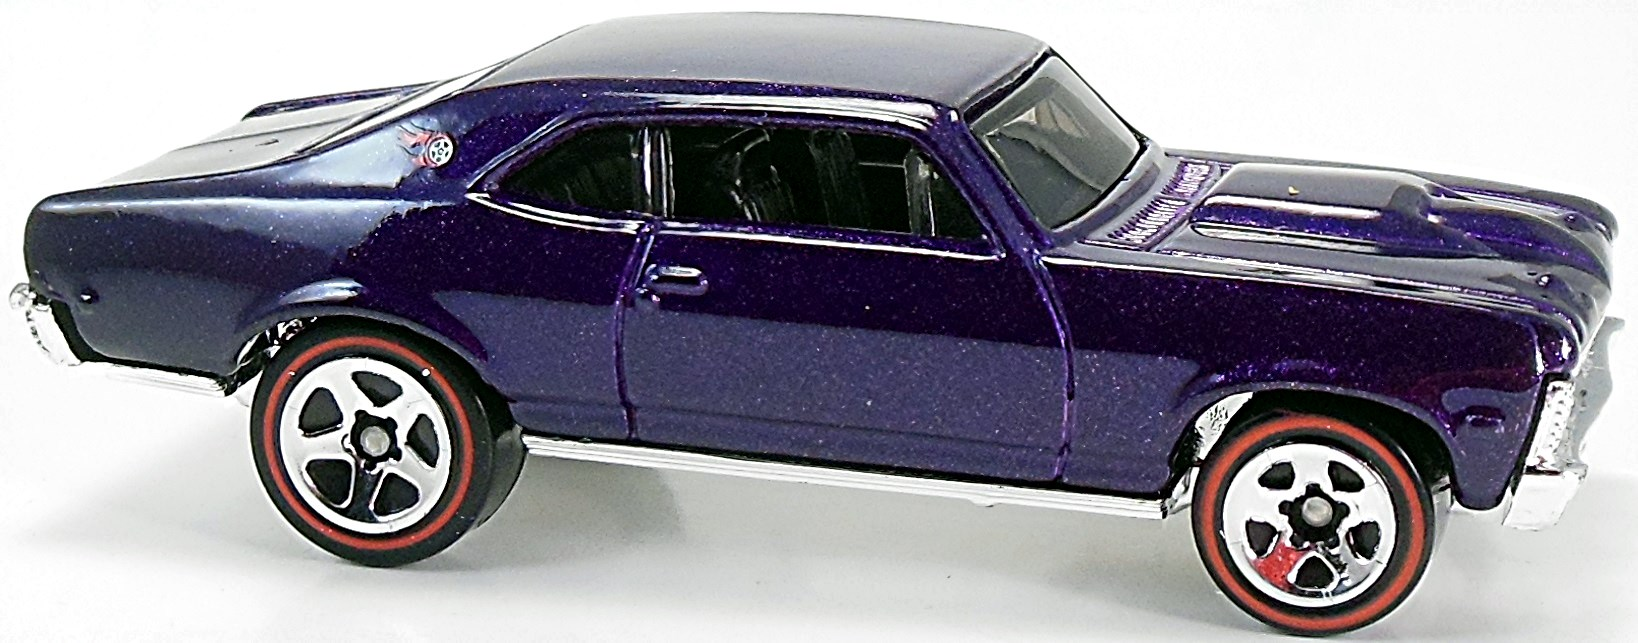 Rod Squad Camo Flying Tiger Lot of 2 2020 Hot Wheels /'68 Chevy Nova #73 Case C